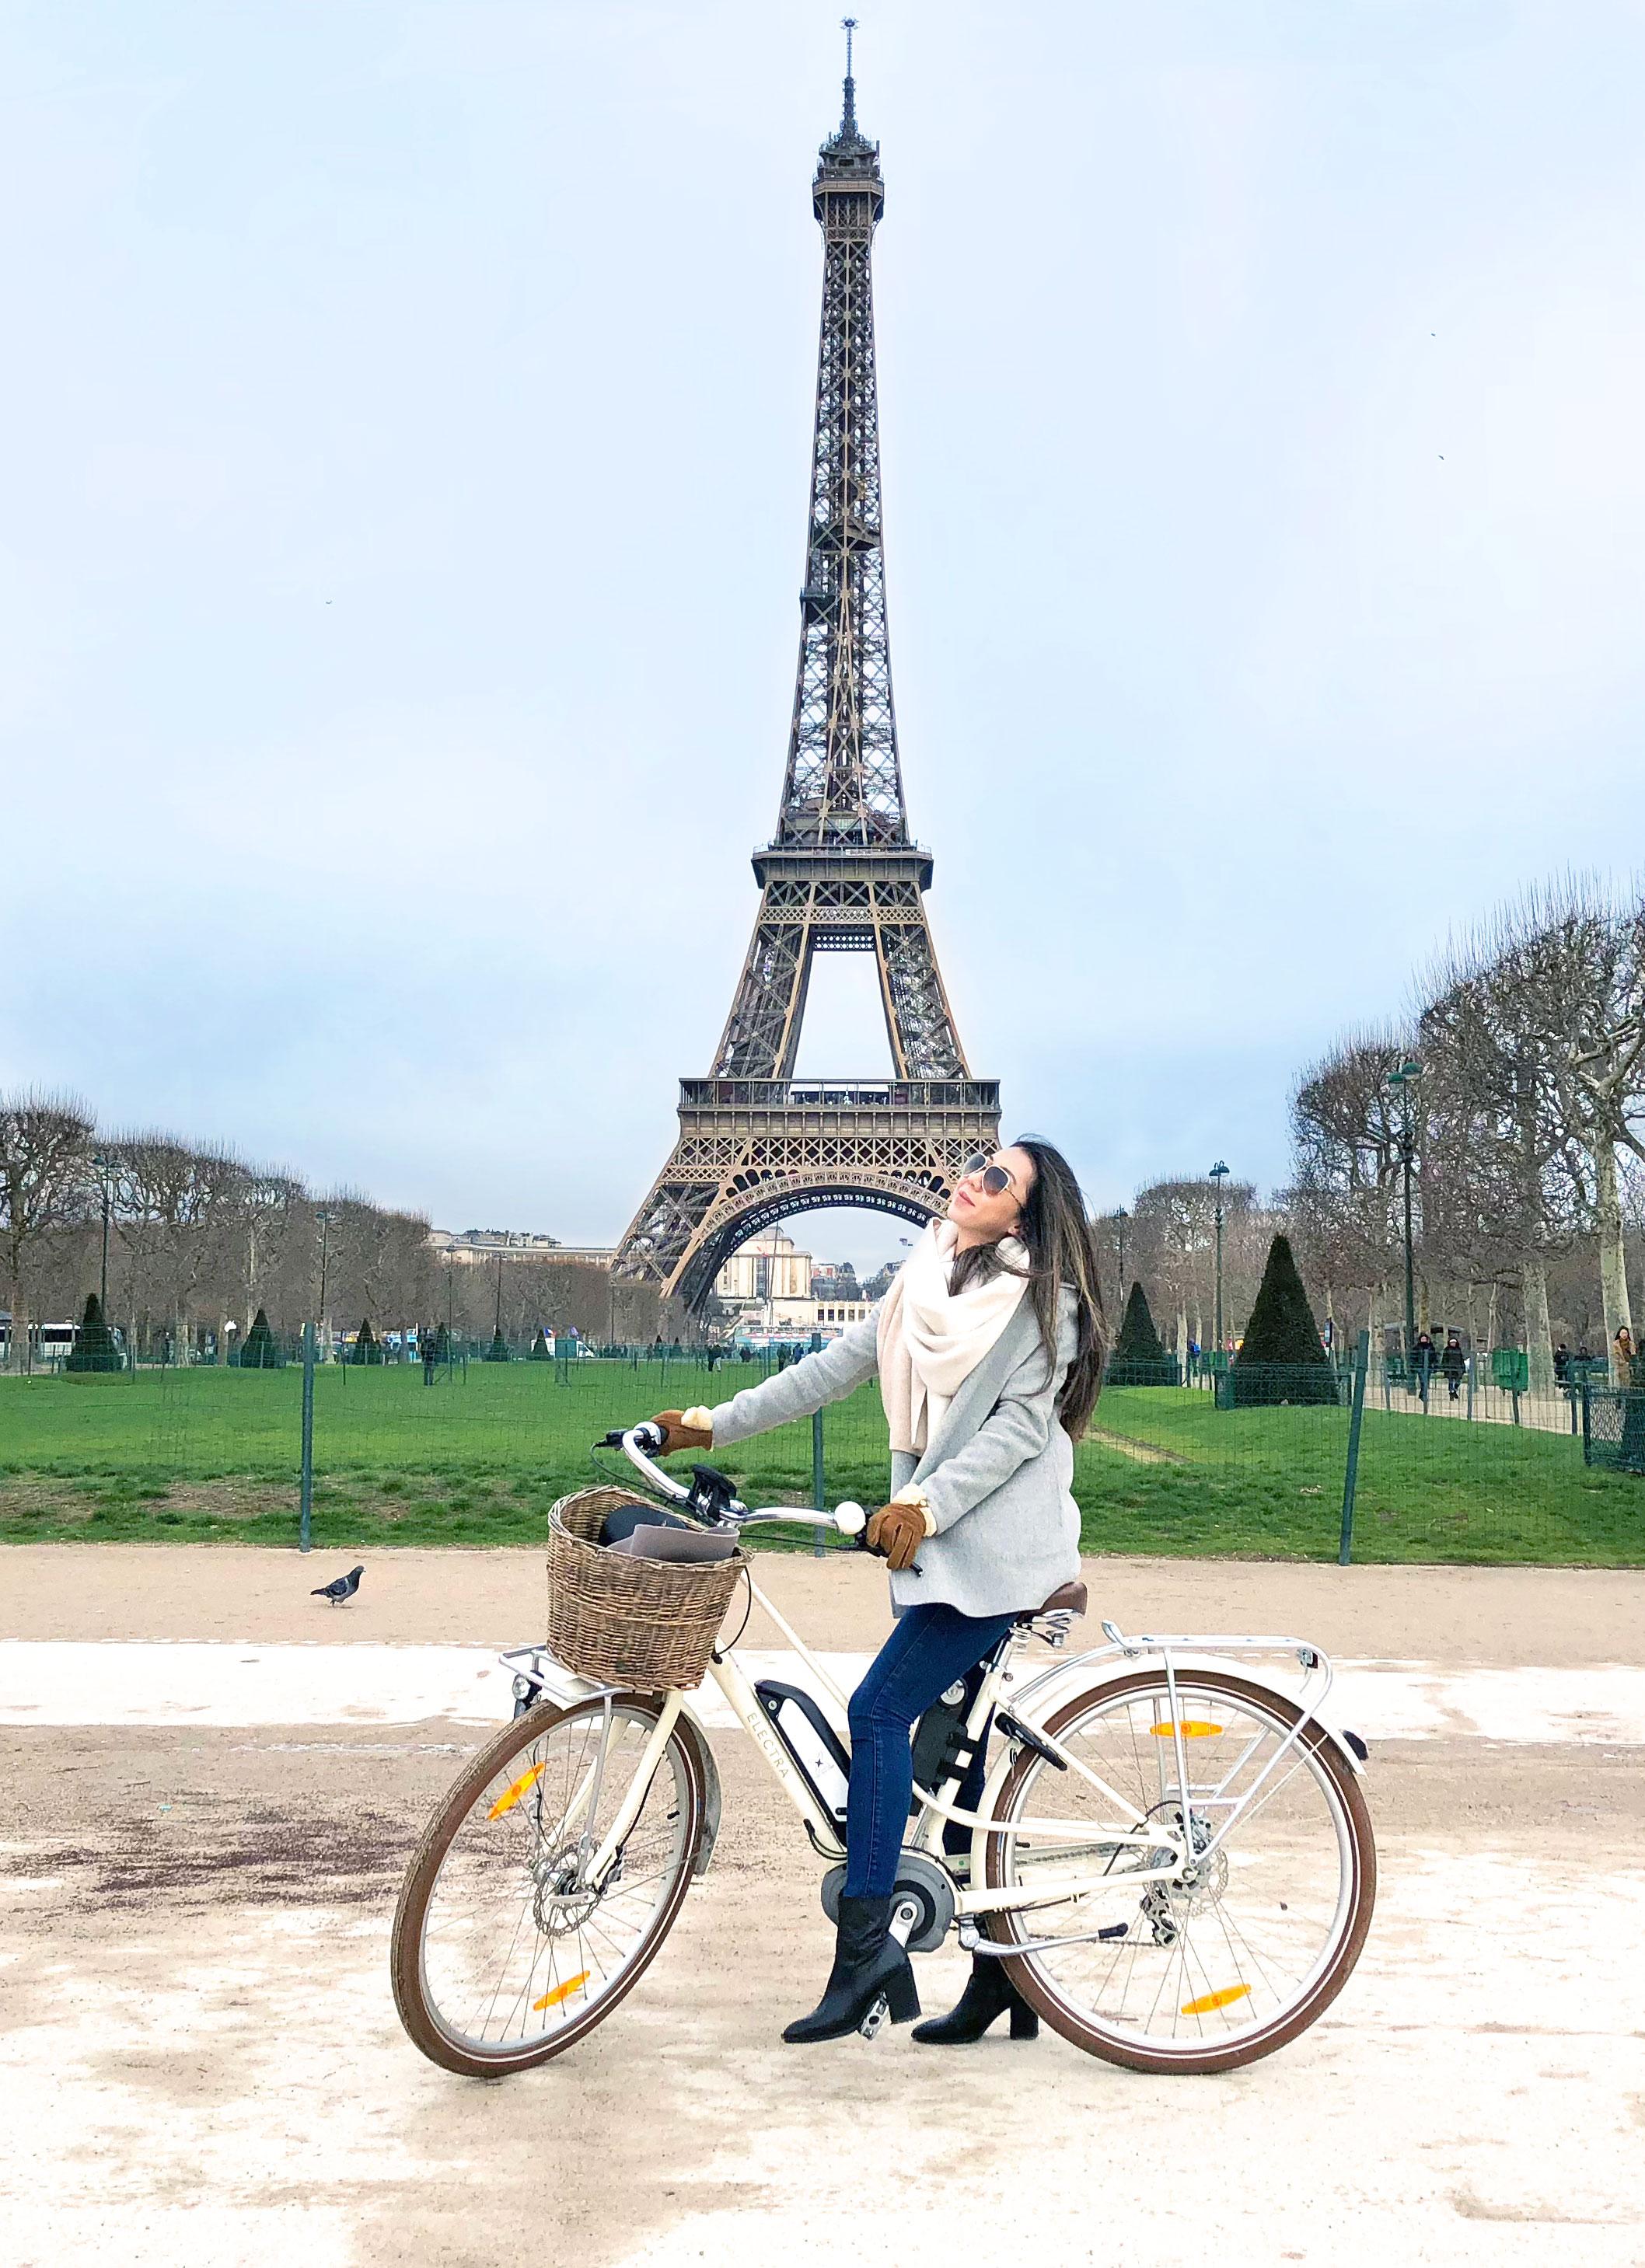 Paris II: Everything - 03.01.18